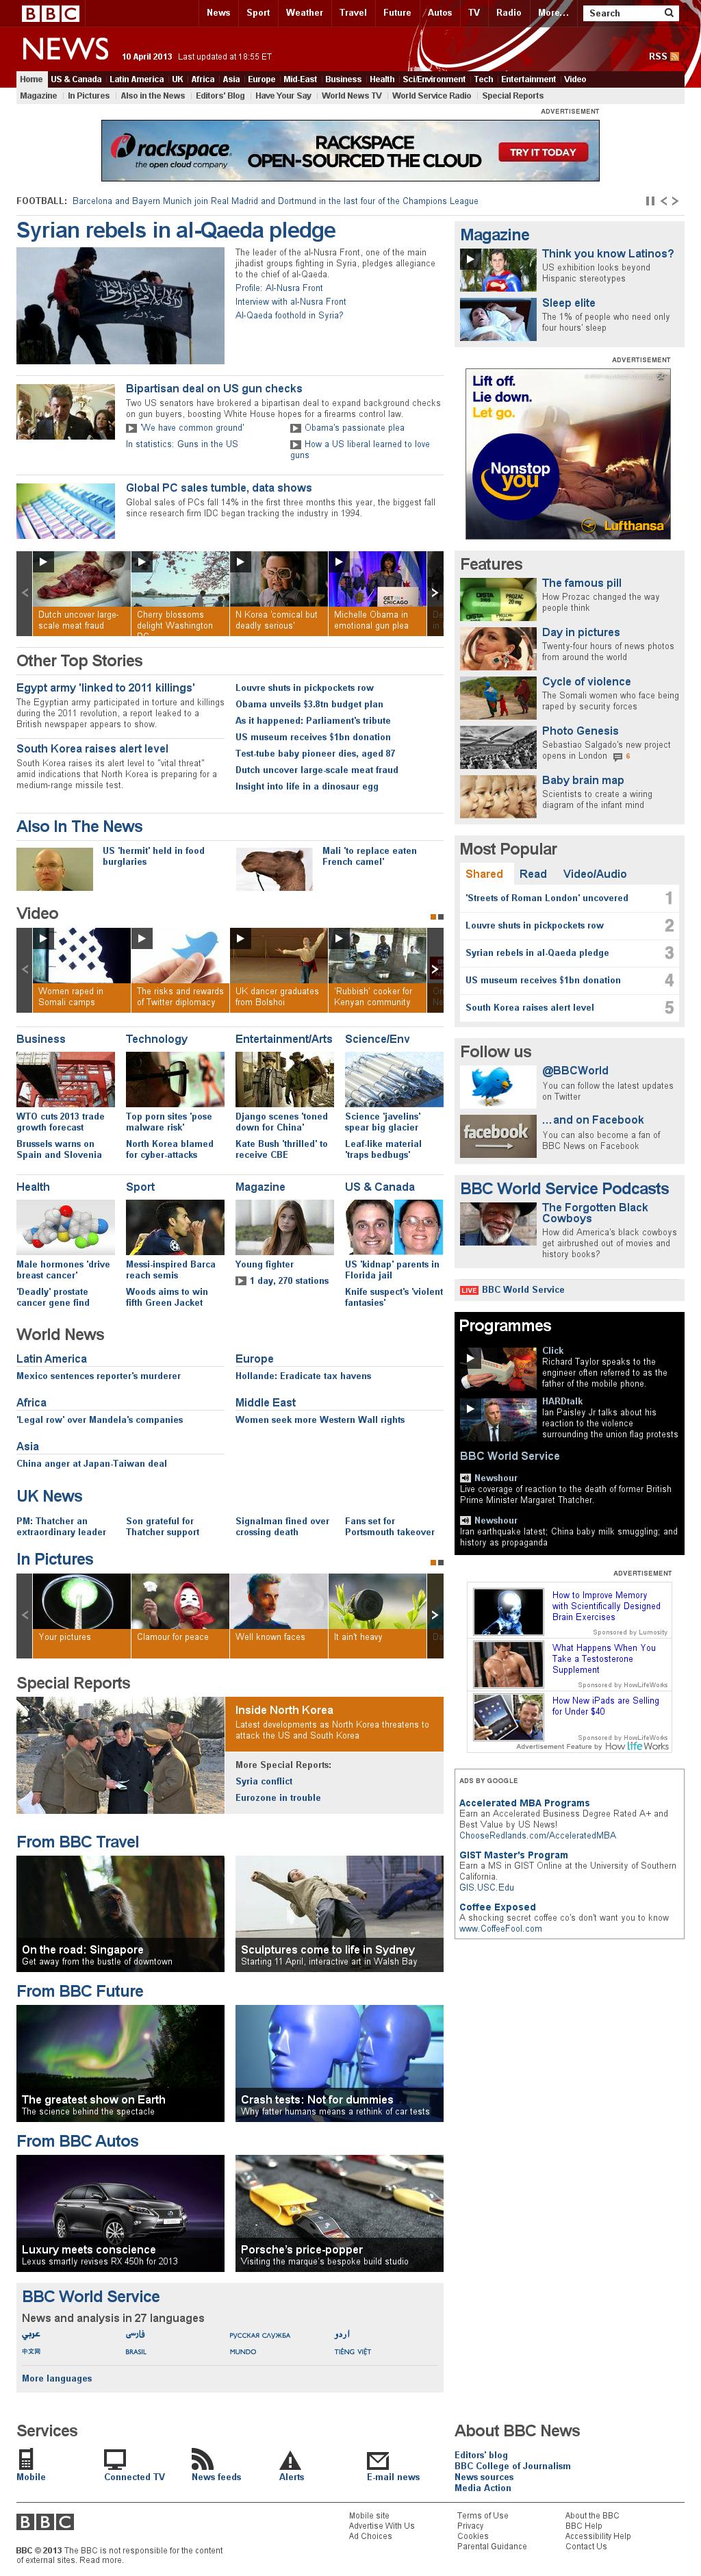 BBC at Wednesday April 10, 2013, 11:02 p.m. UTC